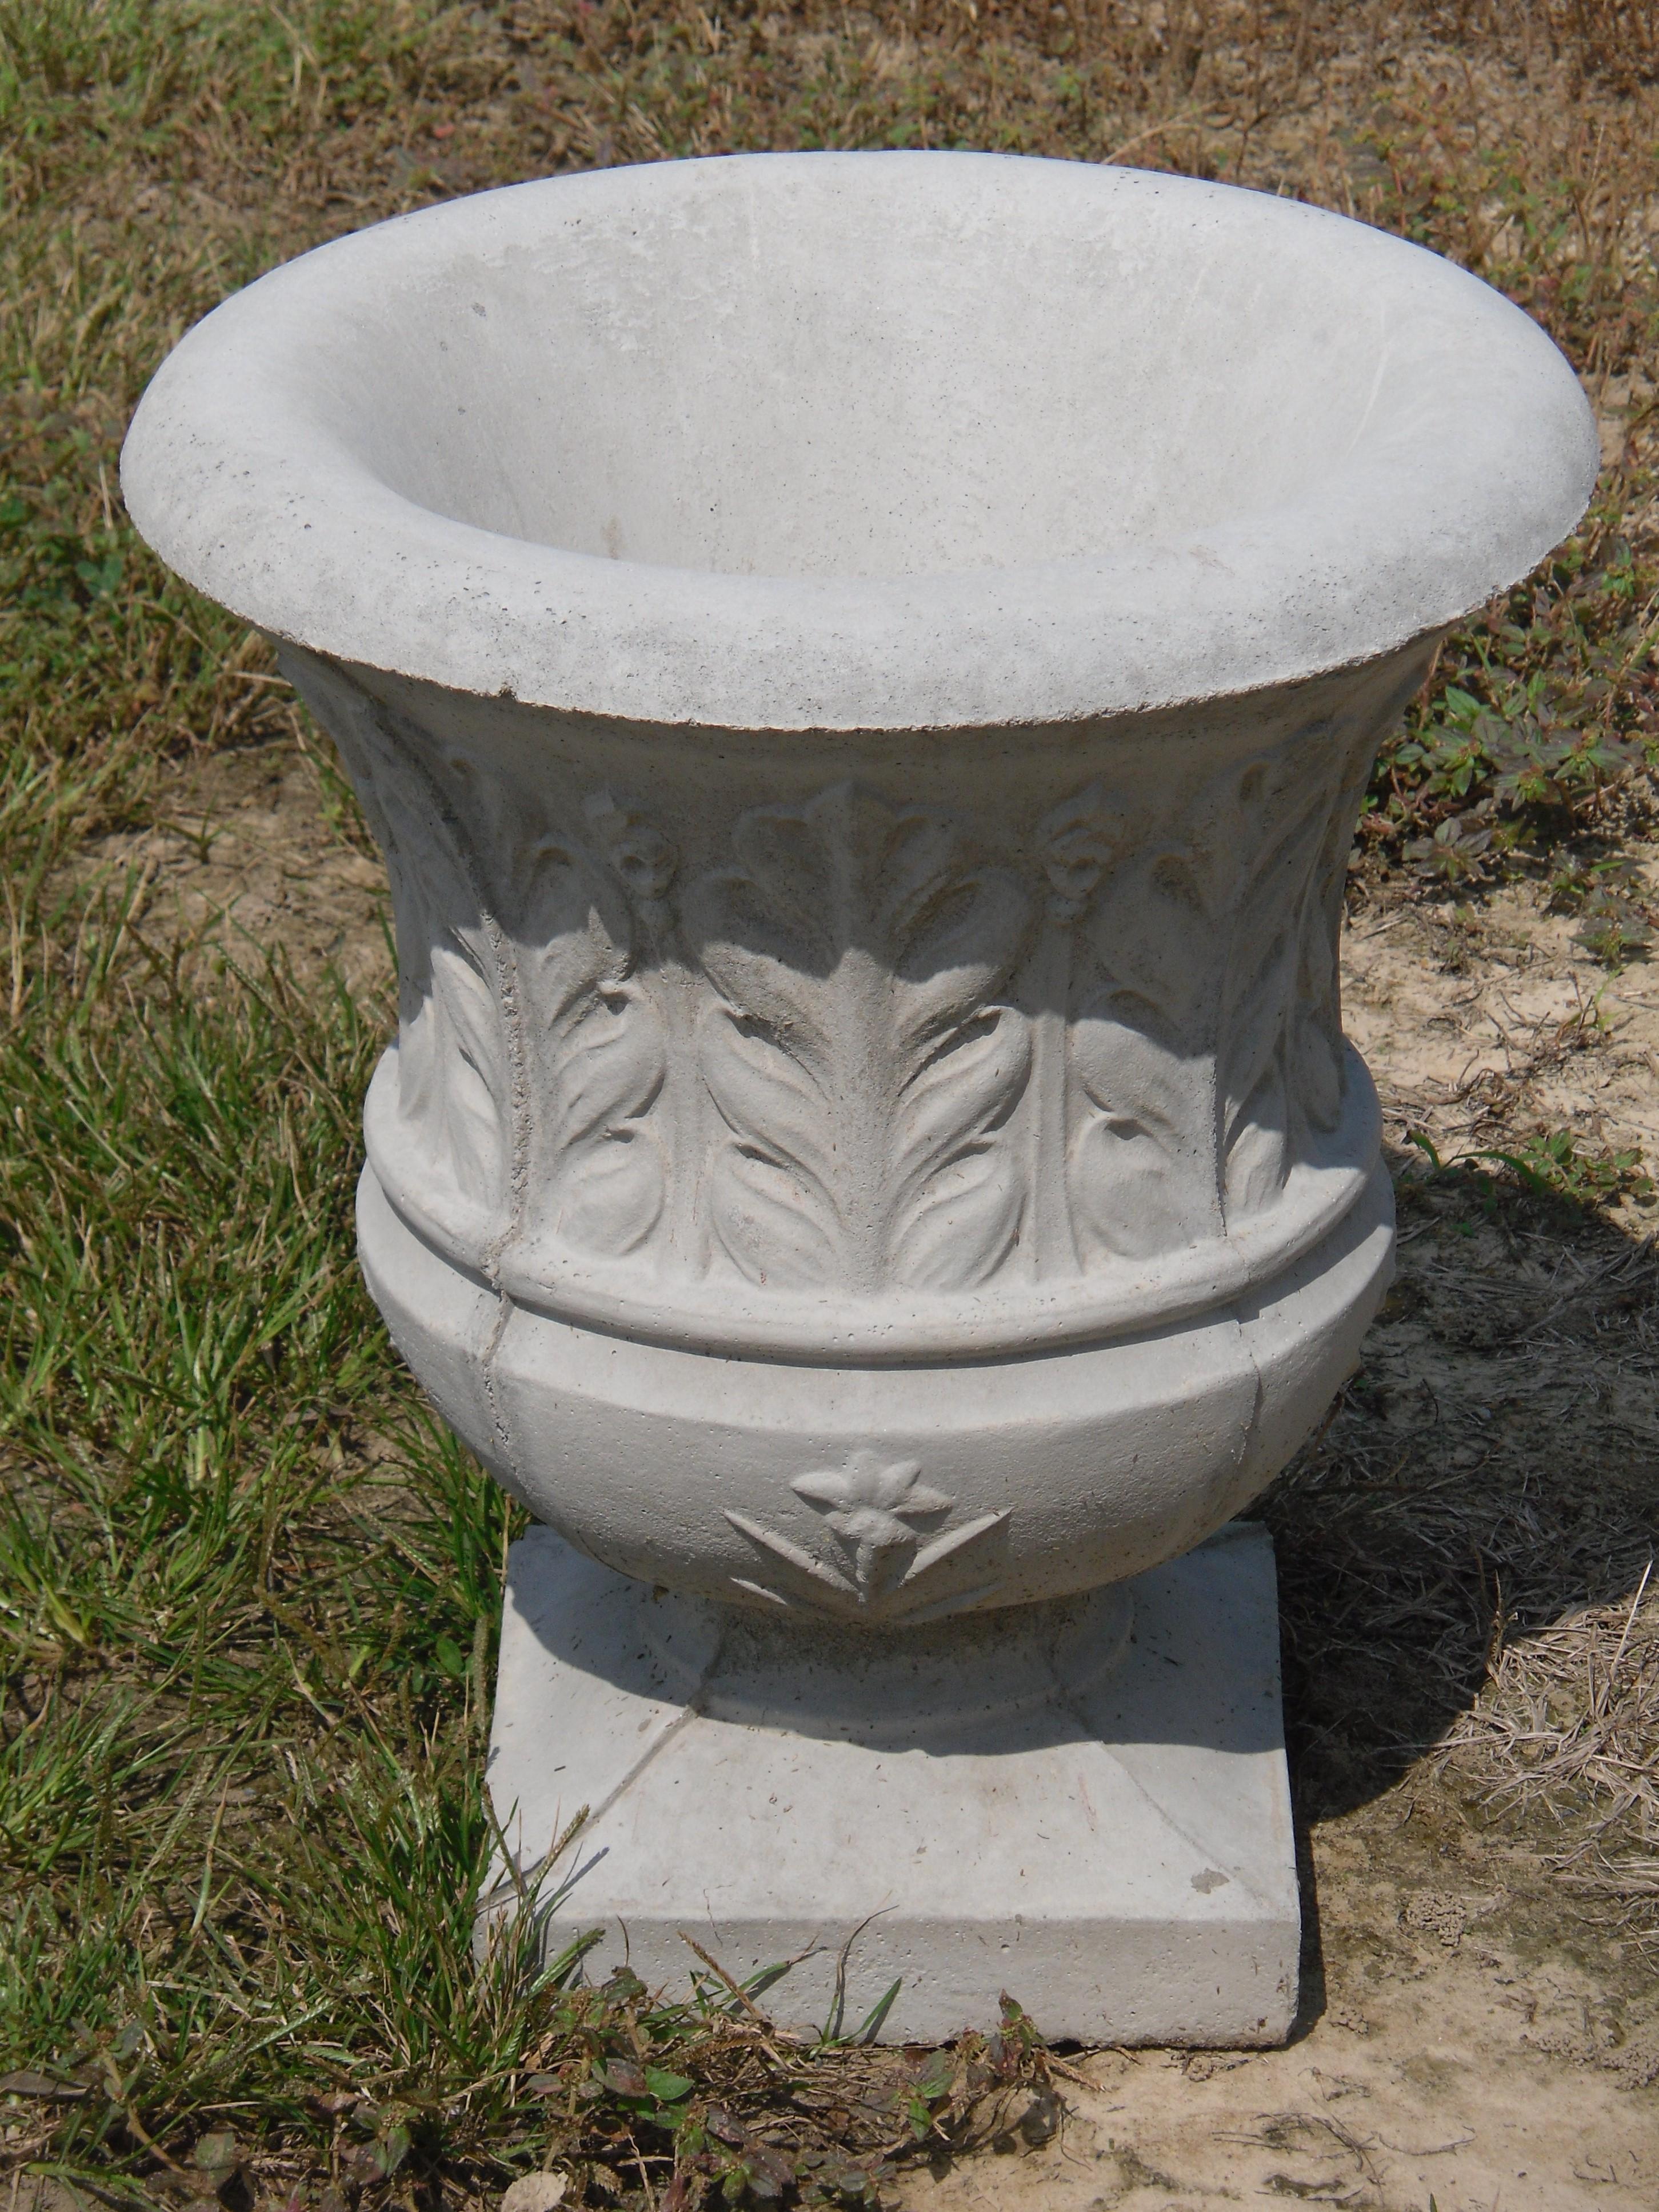 Concrete Planters - Patio Planters - Outdoor Planters - The Cement Barn